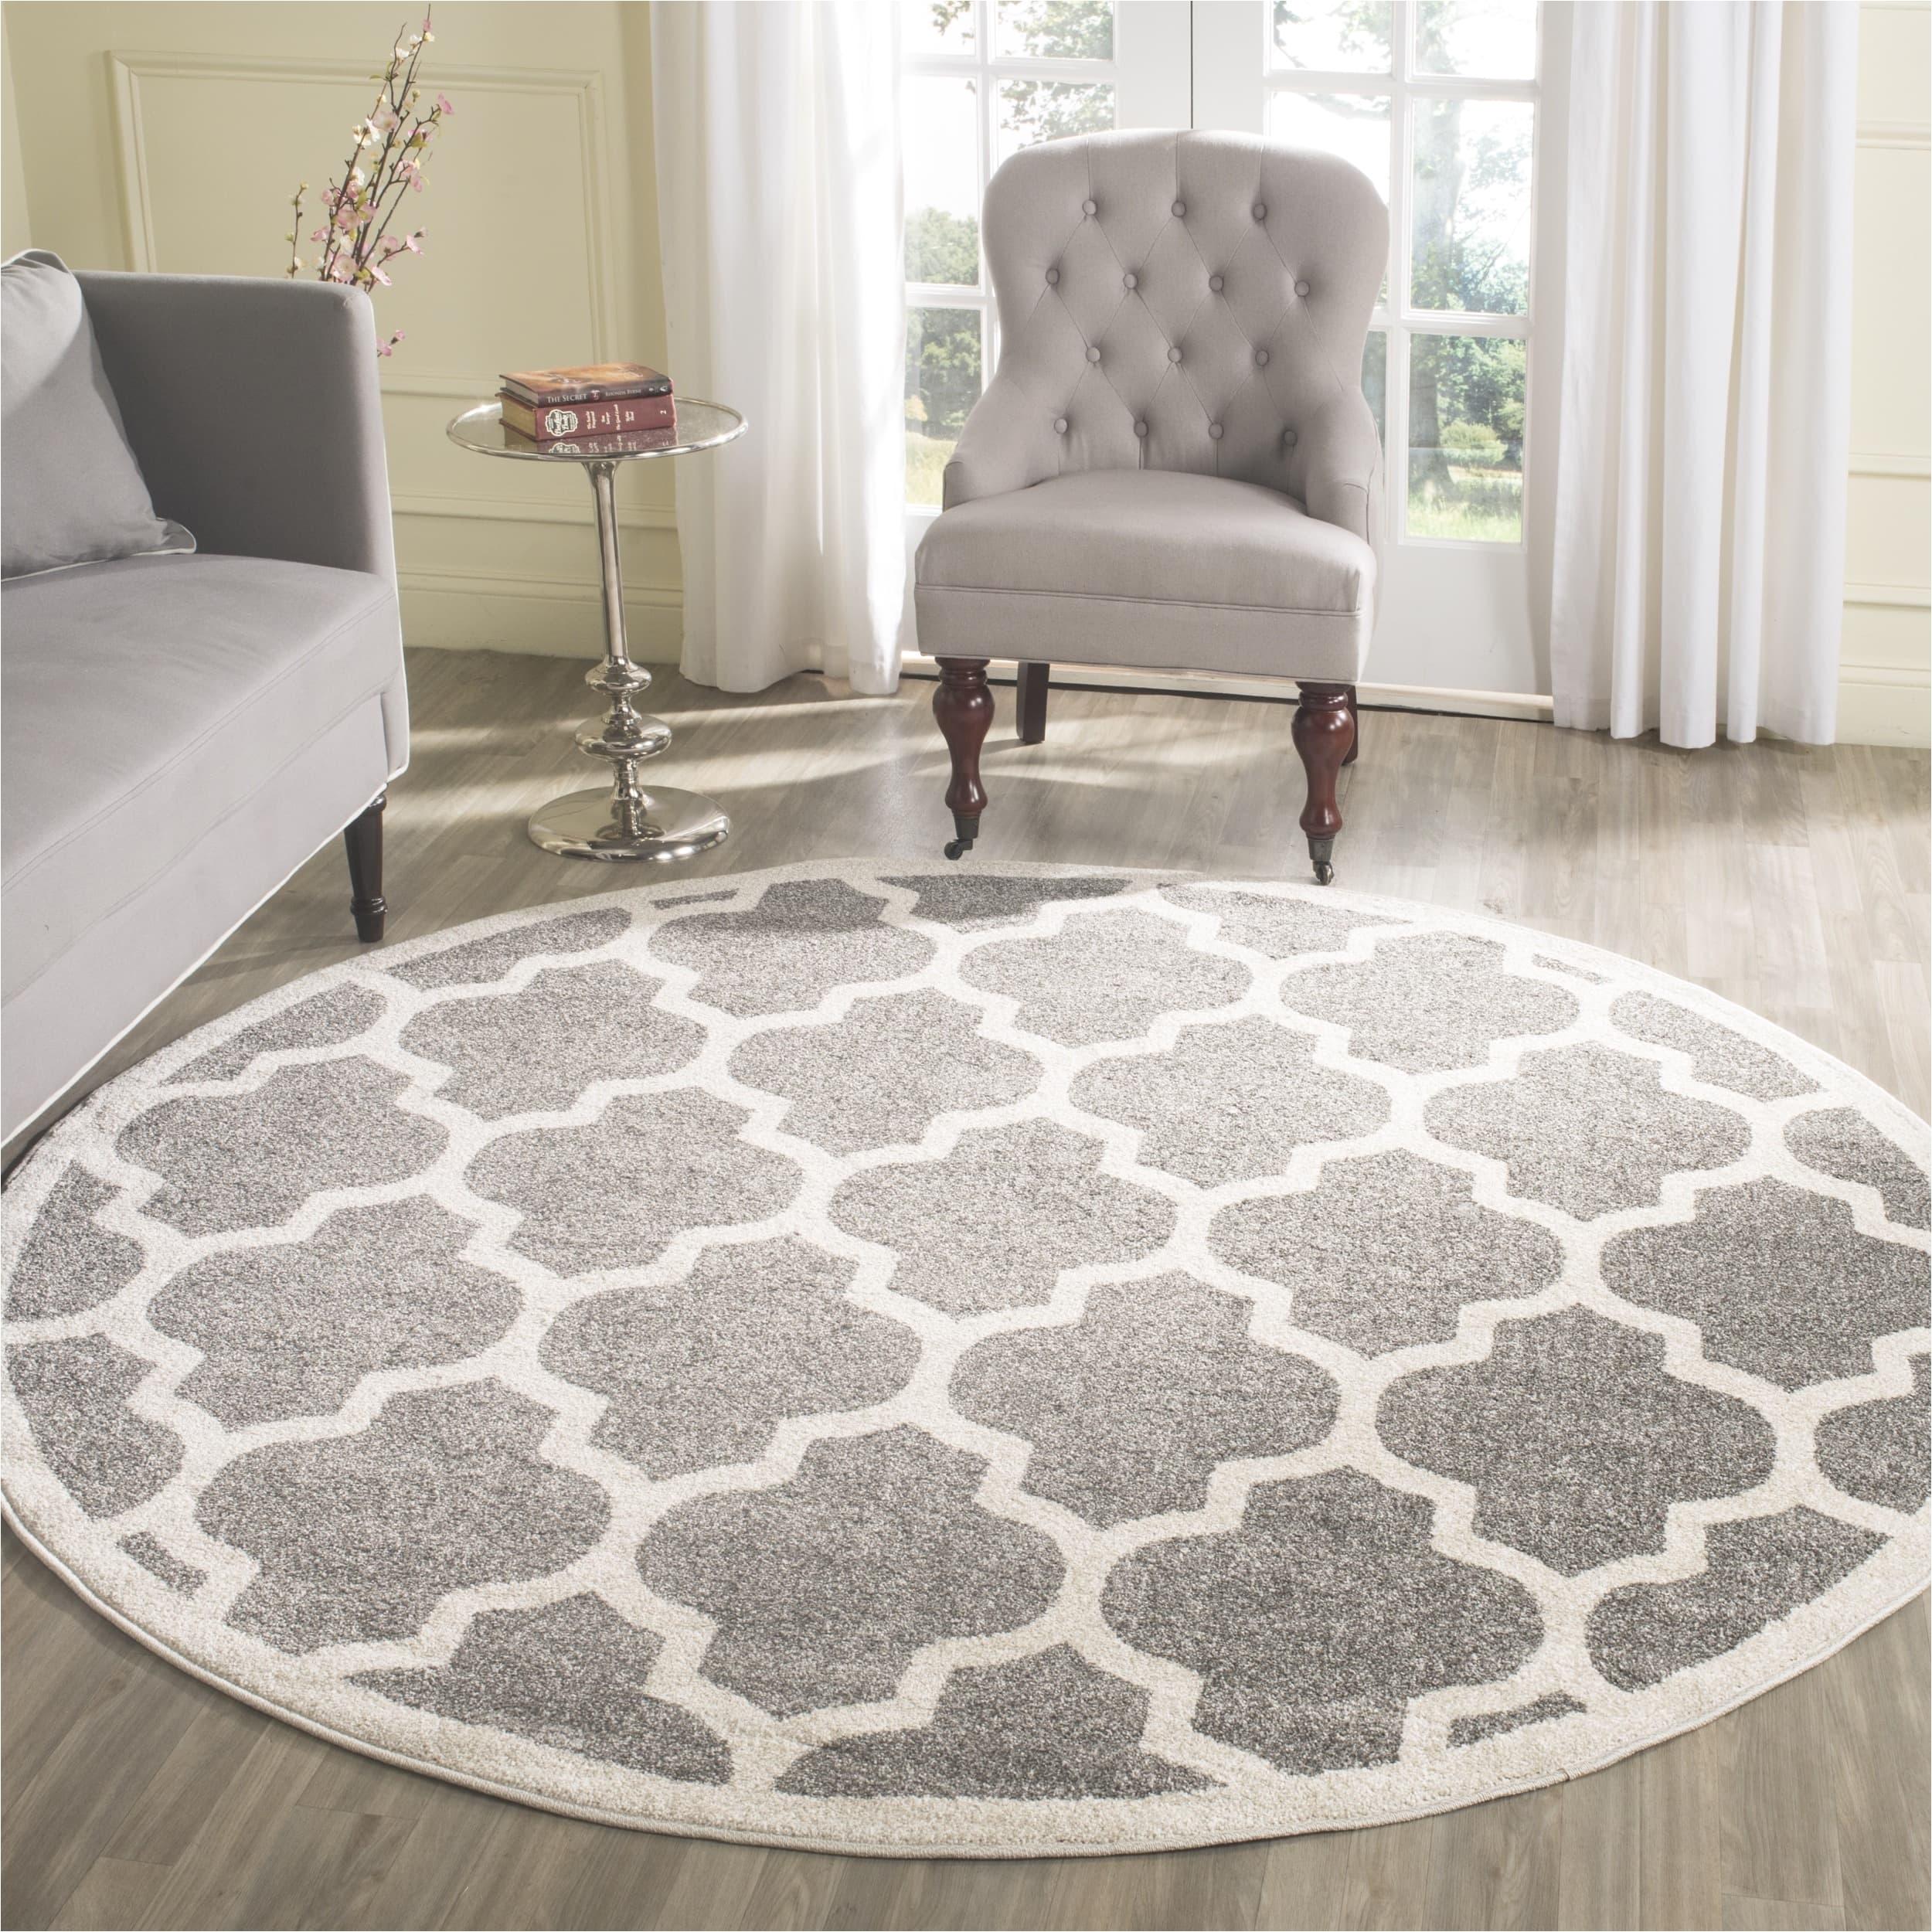 safavieh indoor outdoor amherst dark grey beige rug 9 round free shipping today overstock 16688639